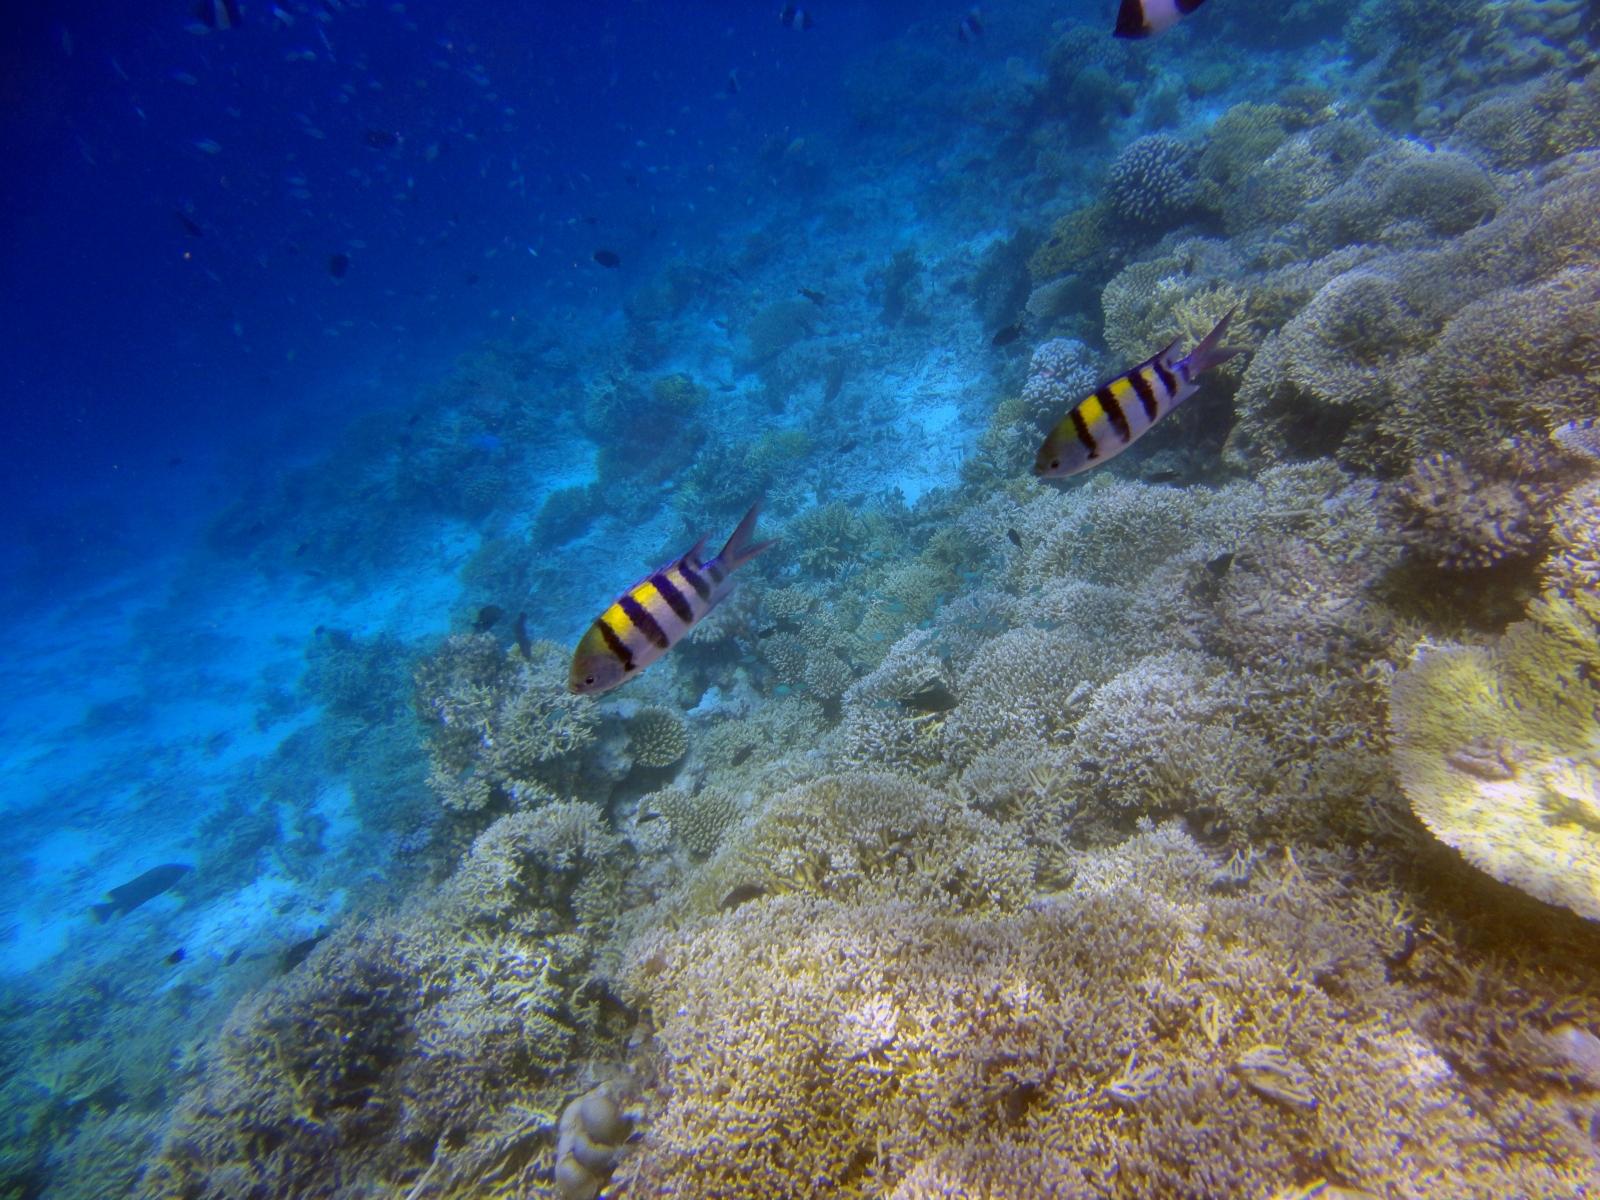 Abudefduf_vaigiensis_002_C_Damiselas-Peces-Payaso_L_Maldivas_U_Sebas_30062015